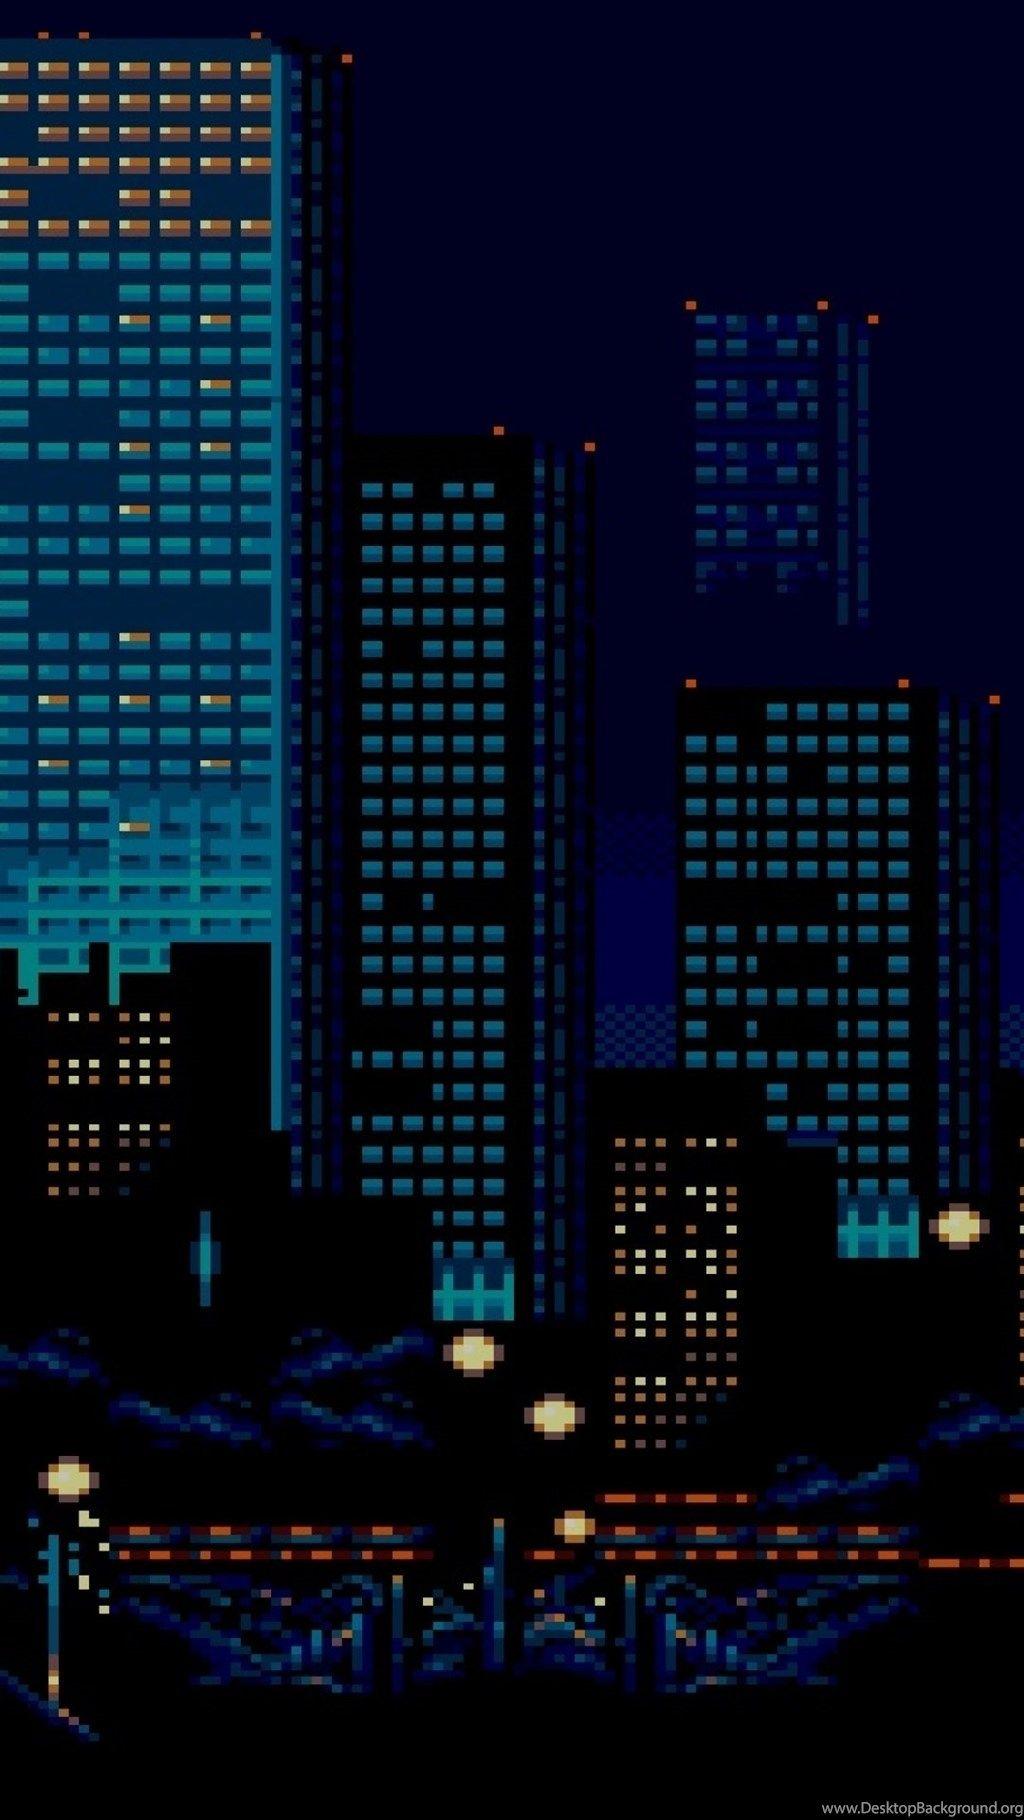 Acceptable 8 Bit Iphone Wallpaper Pixel City Pixel Art Art Wallpaper